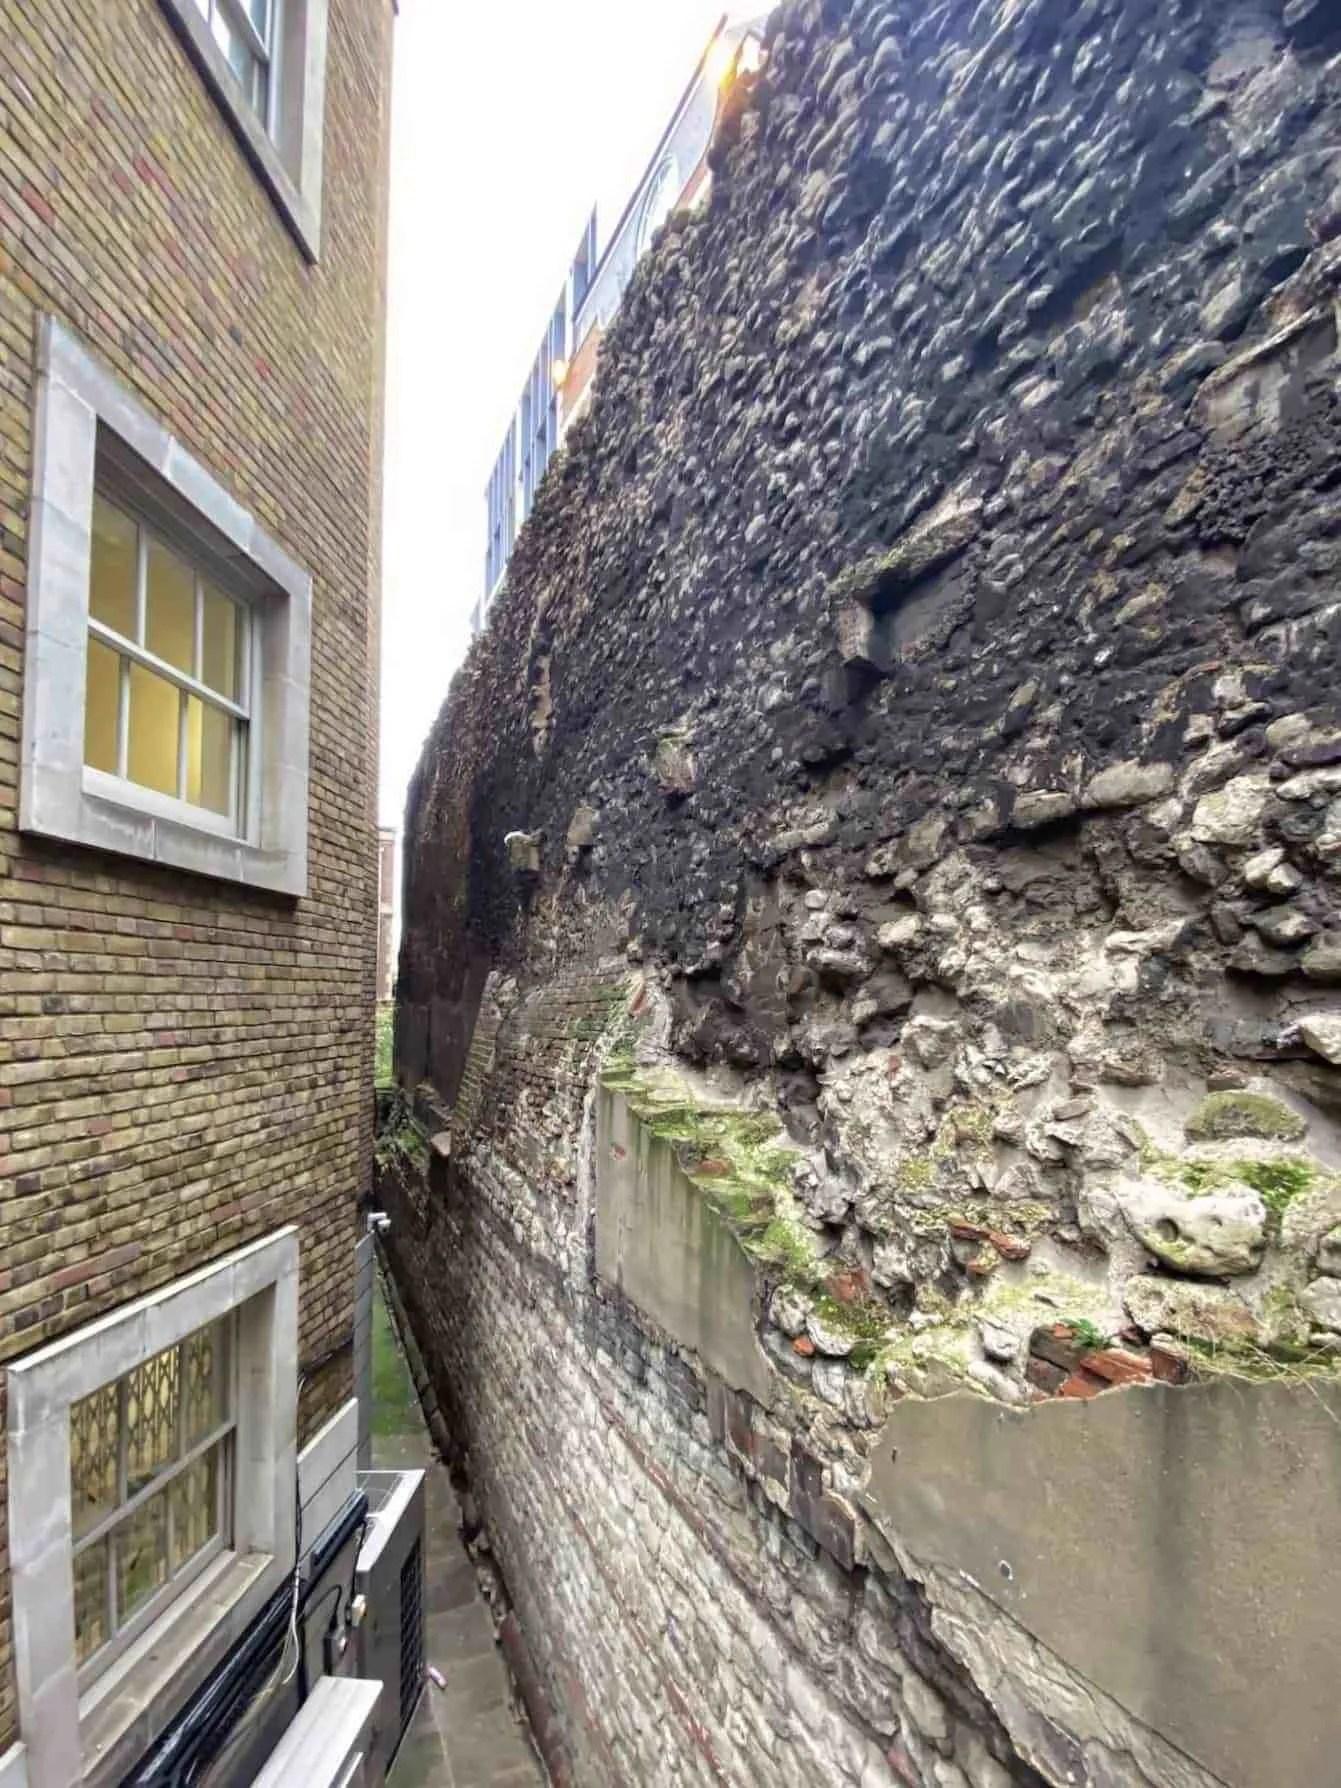 London Wall Walk - Plaque 3